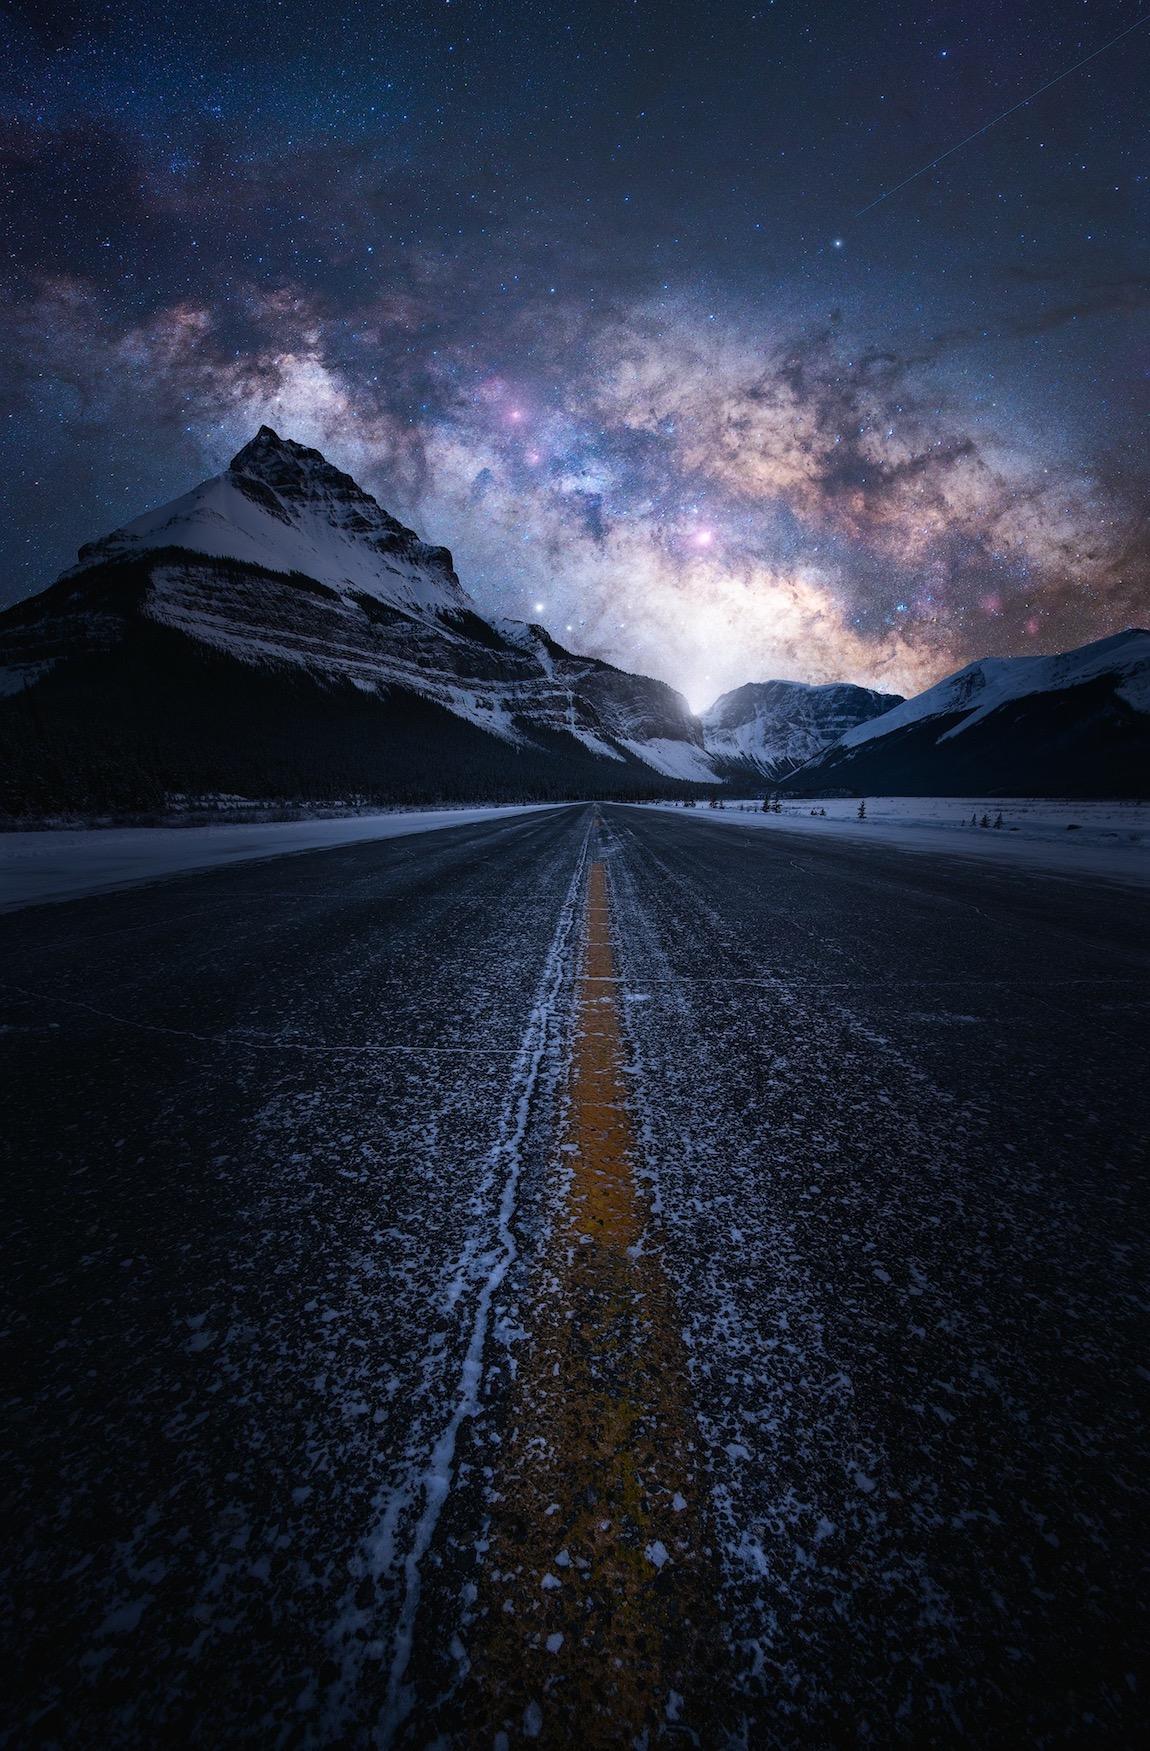 Daniel Greenwood Night Landscape Photography